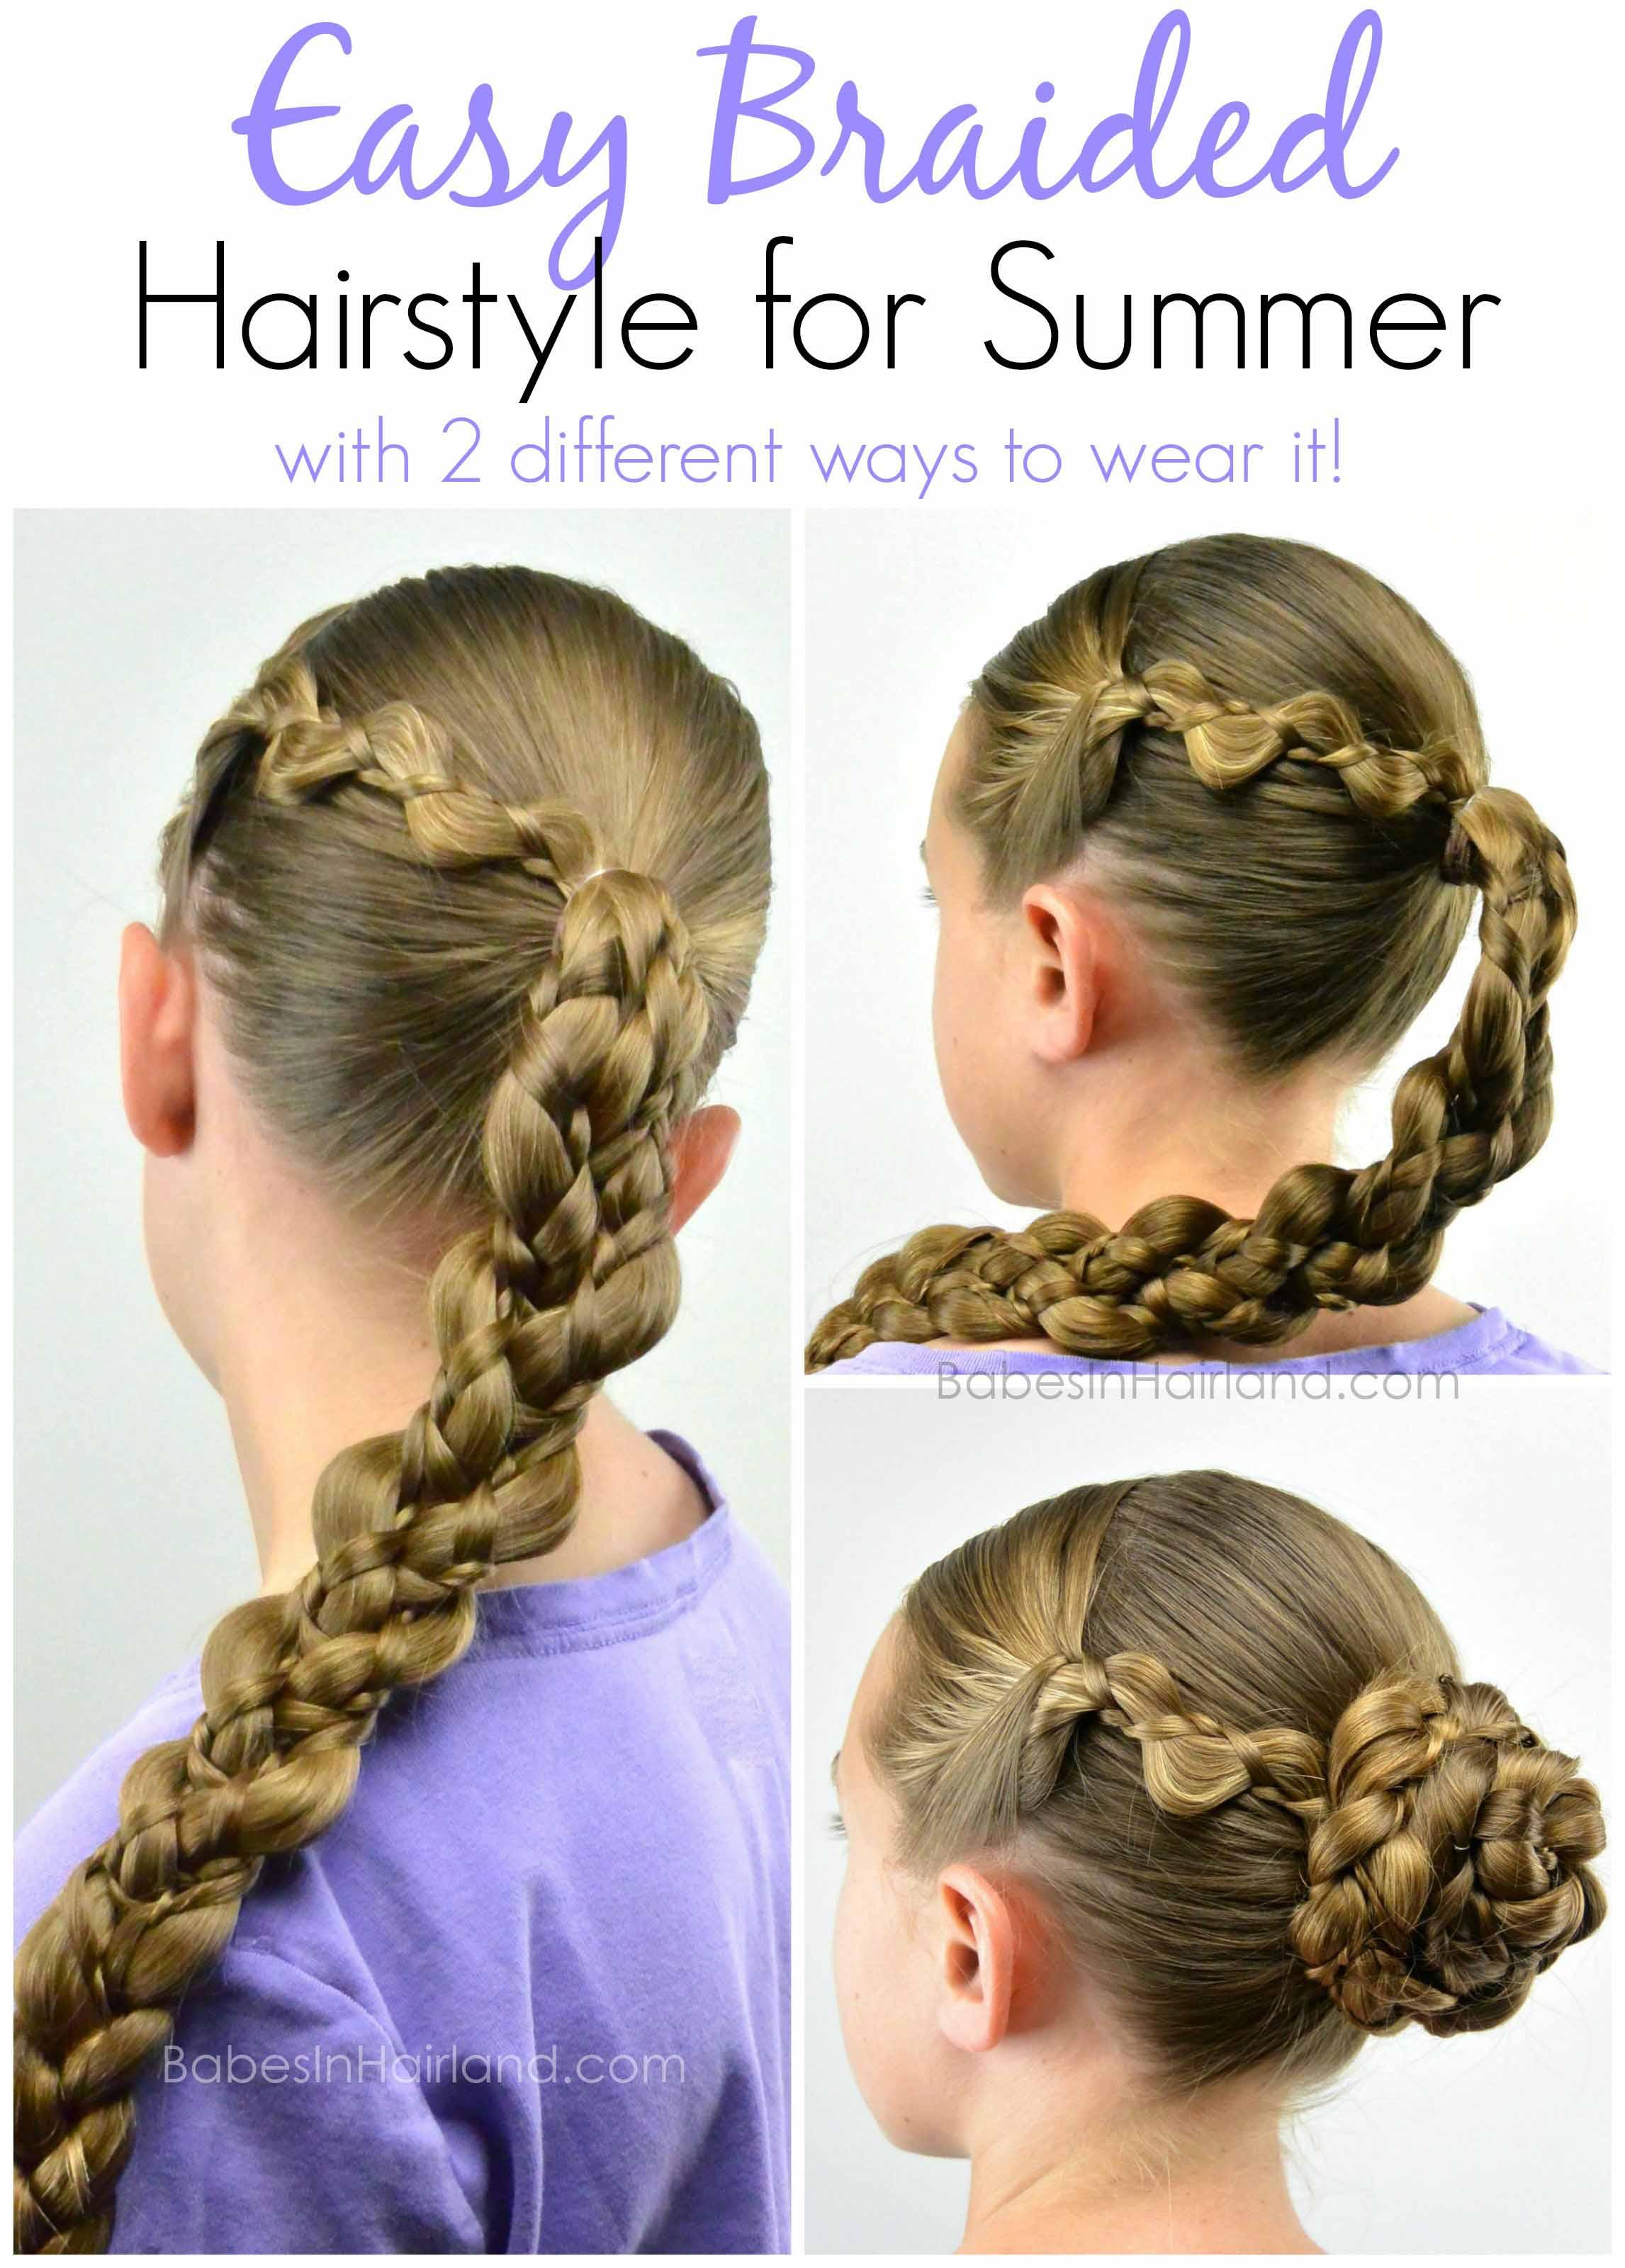 Swell Easy Braided Summer Hairstyle Babes In Hairland Short Hairstyles Gunalazisus